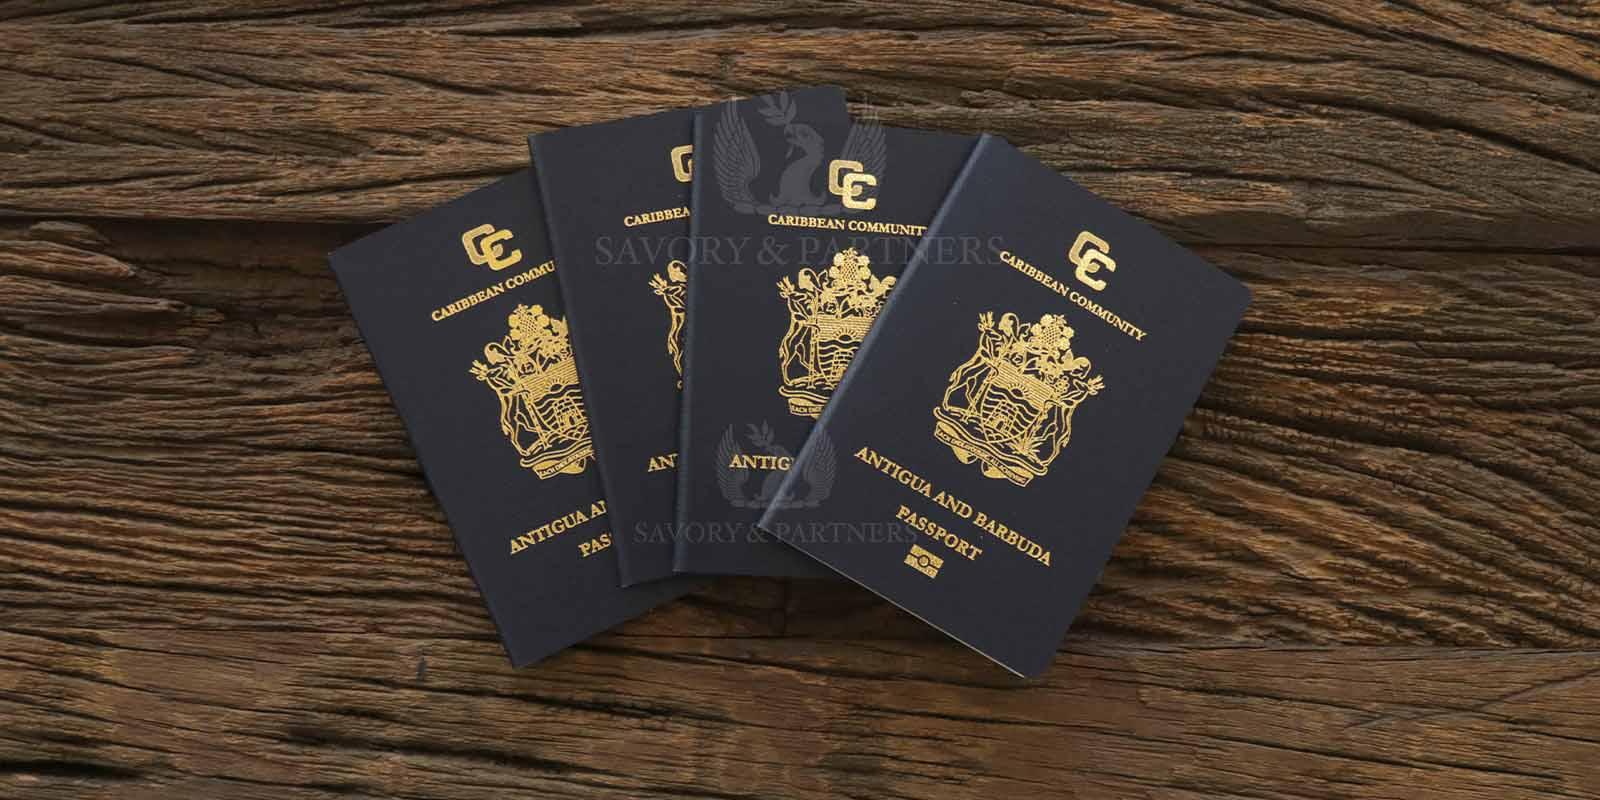 Antigua & Barbuda citizenship by investment program - Savory & Partners - Dubai, UAE